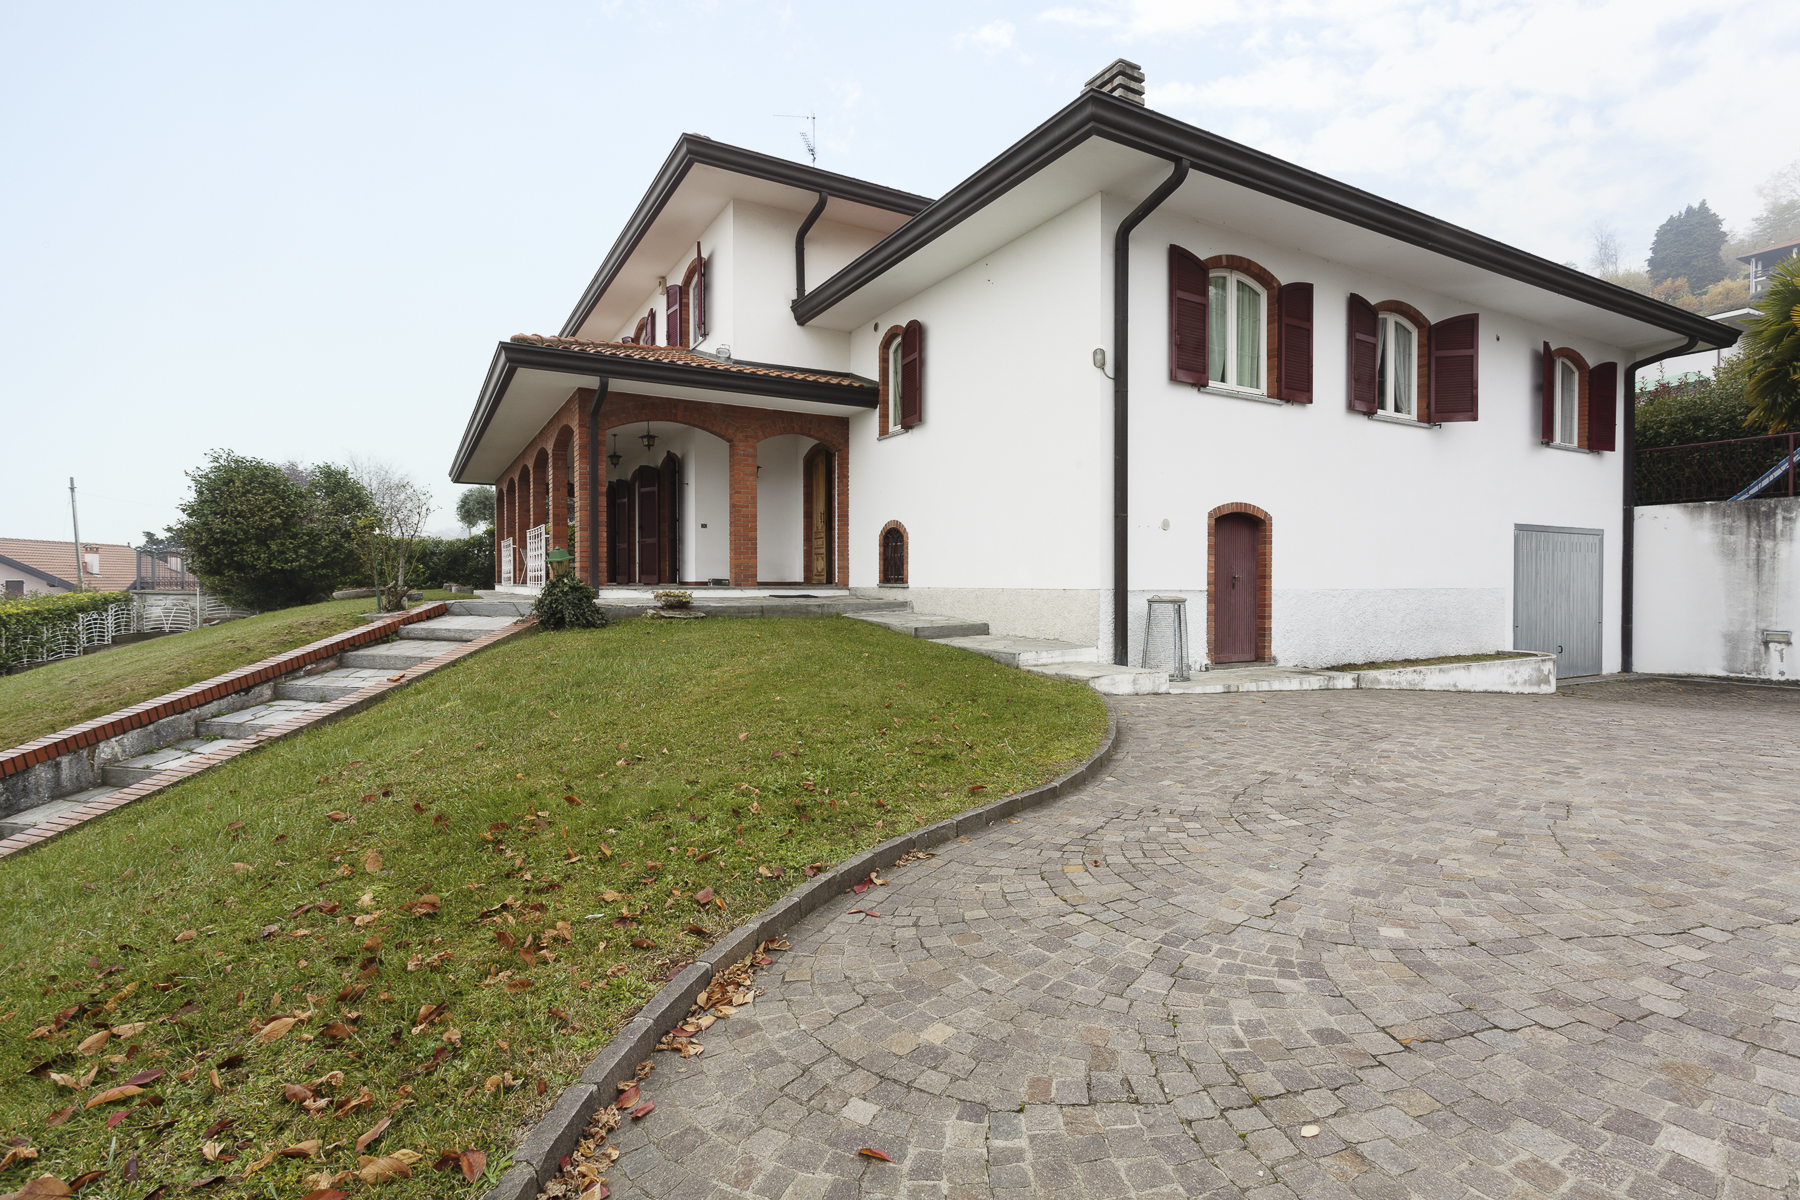 Single Family Home for Sale at Gracious villa overlooking Lake Maggiore Colli Fioriti Other Novara, Novara 28010 Italy